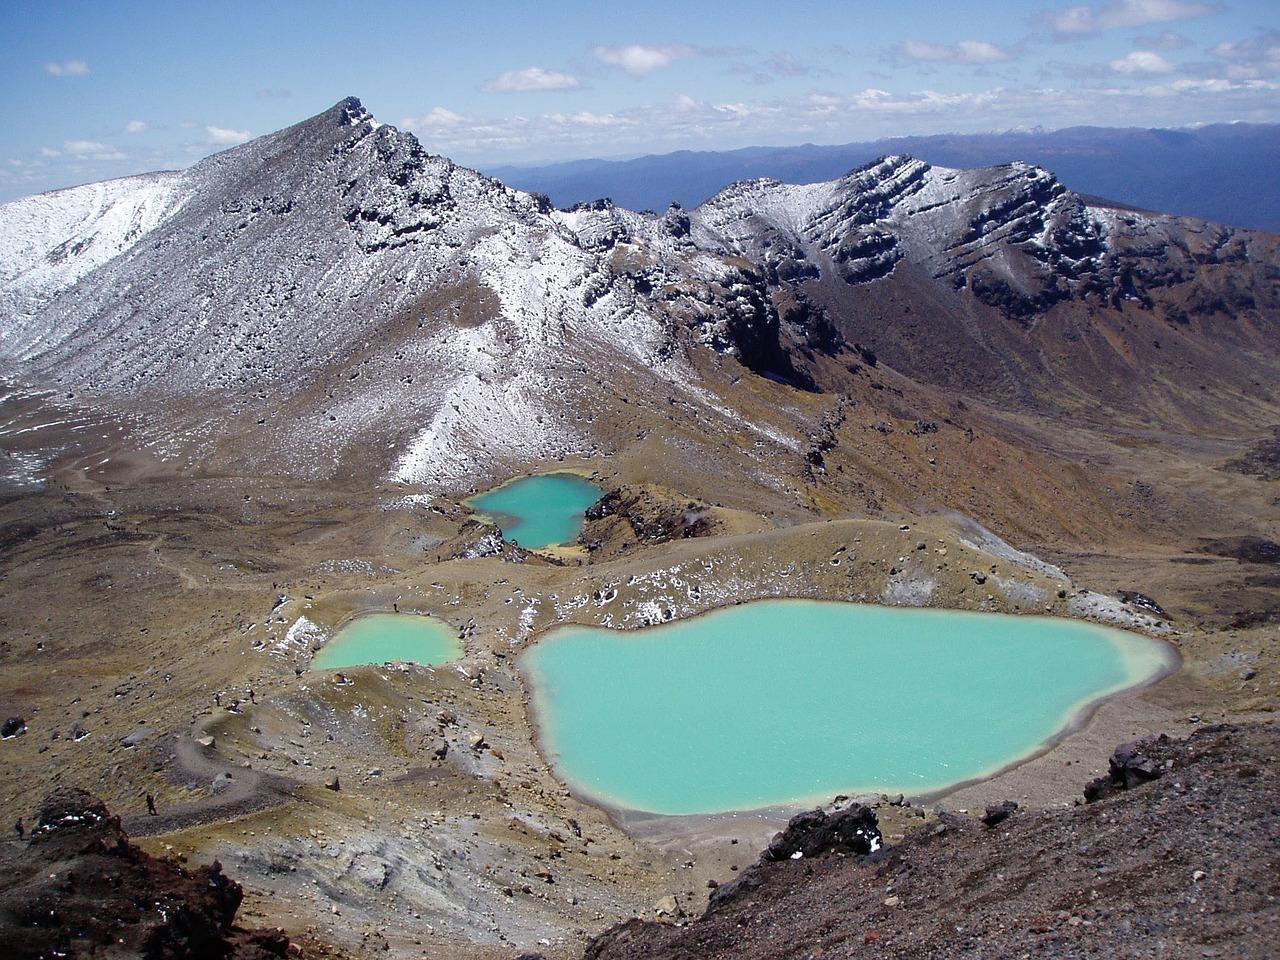 Roteiro Nova Zelândia, Wellington, Taupo, Rotorua e Auckland